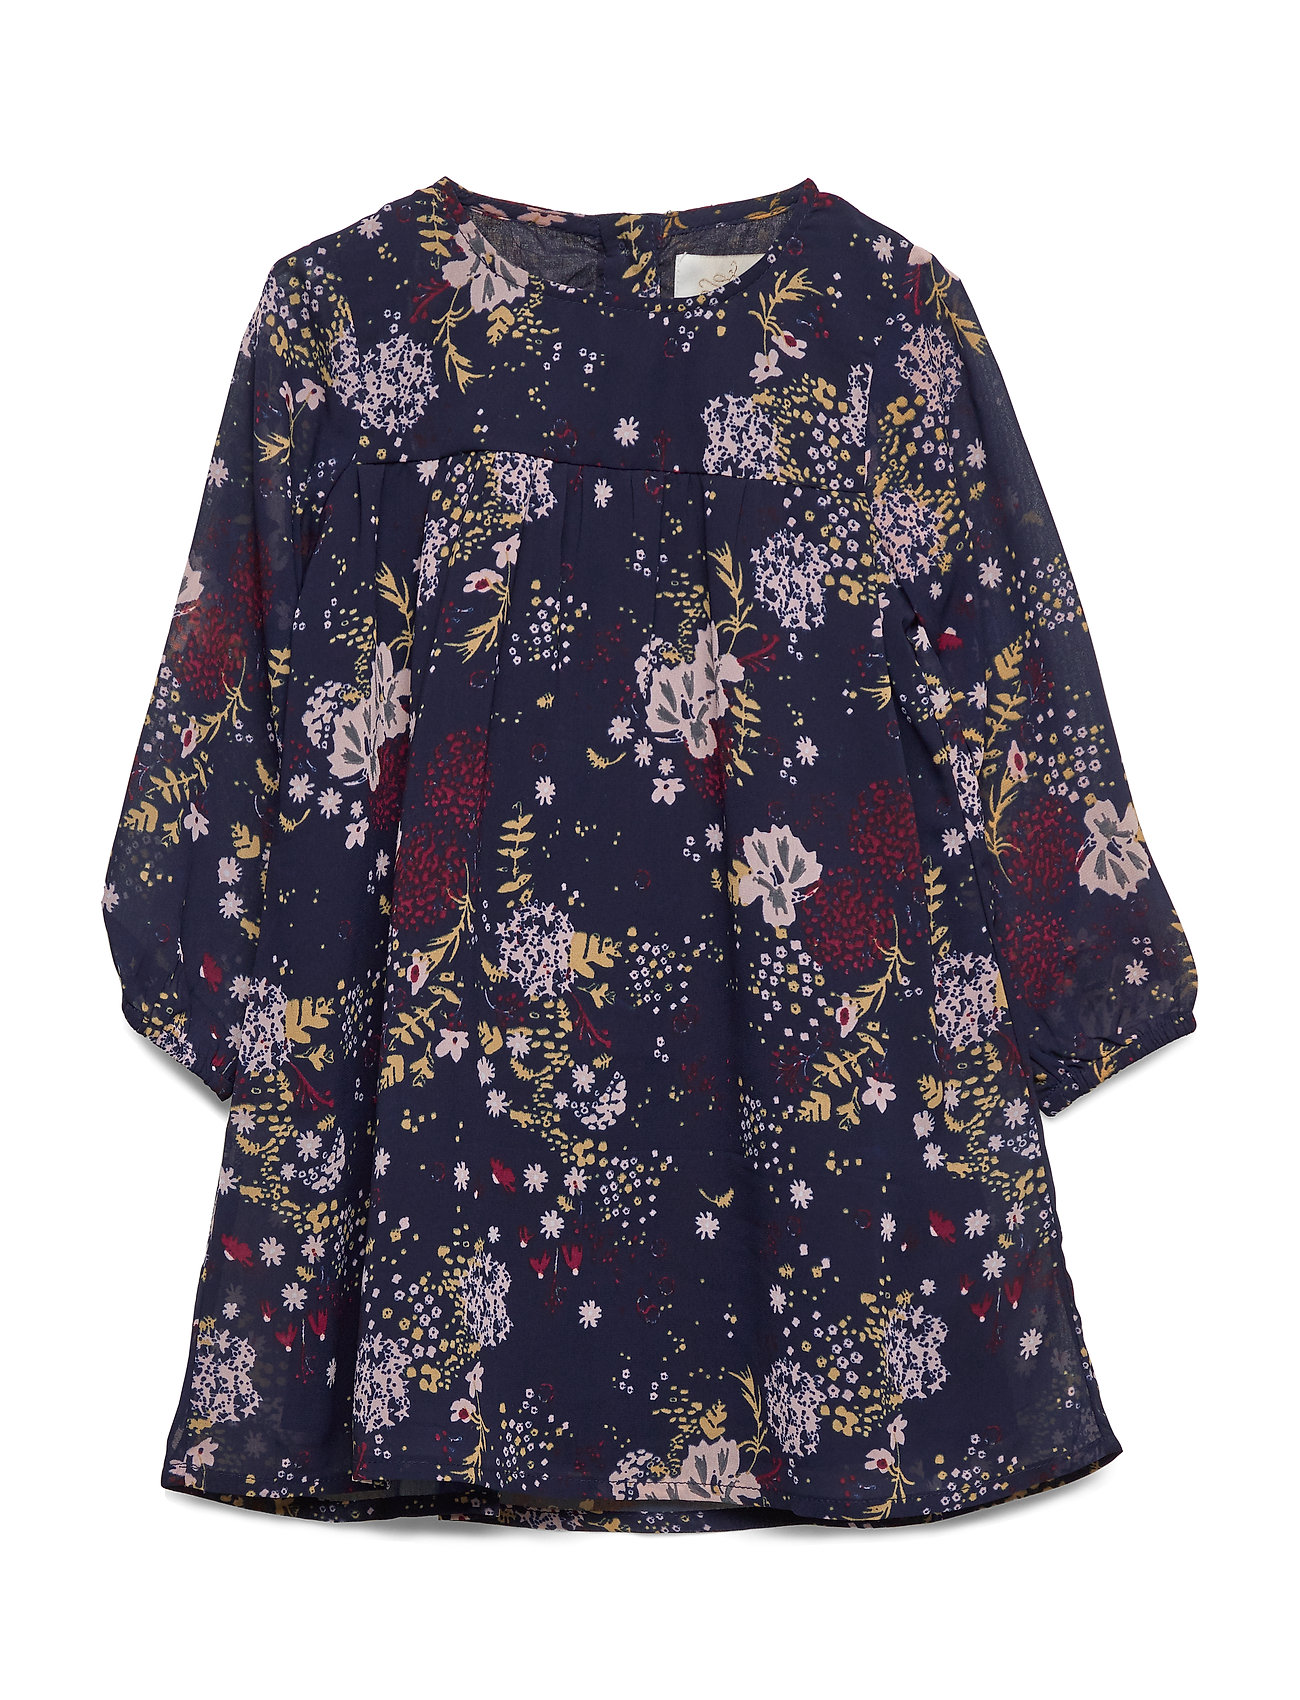 Creamie Dress Printed Chiffon - TOTAL ECLIPSE